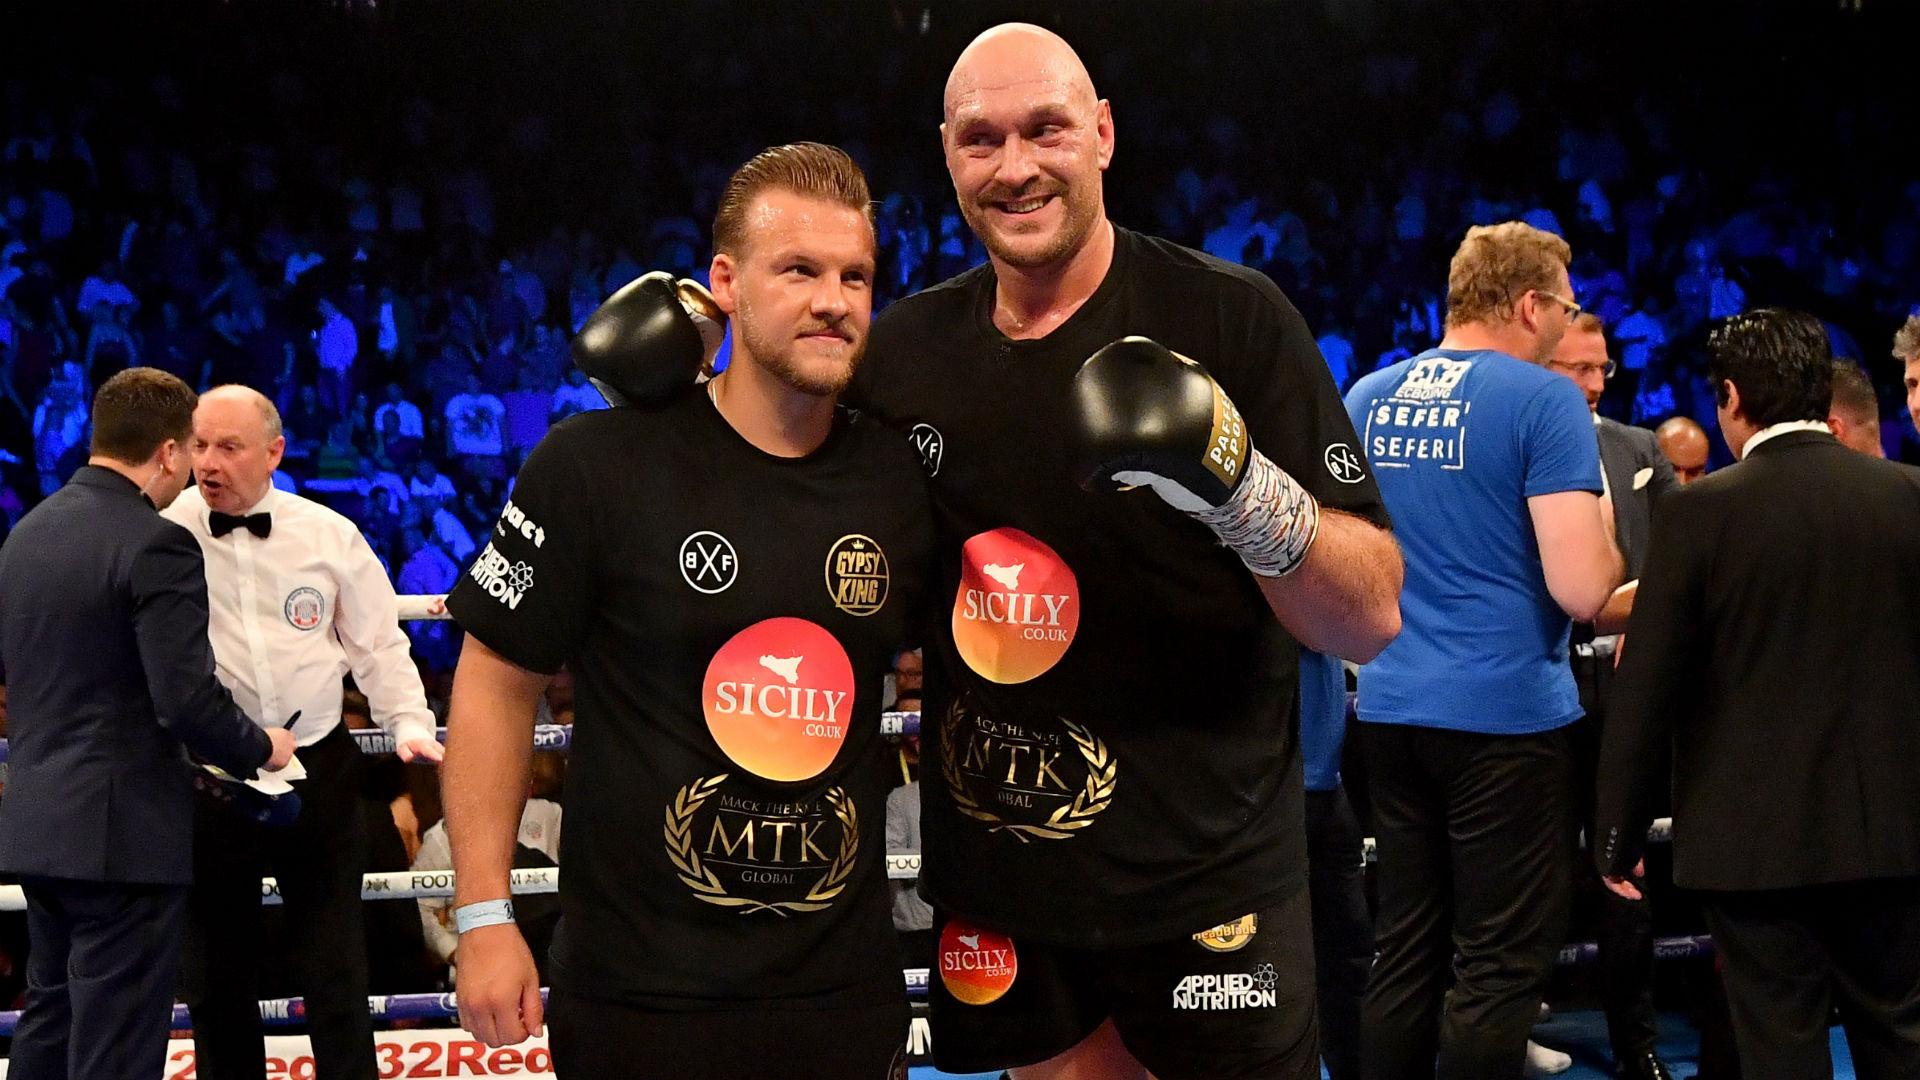 Fury splits from trainer Davison two months from Wilder fight